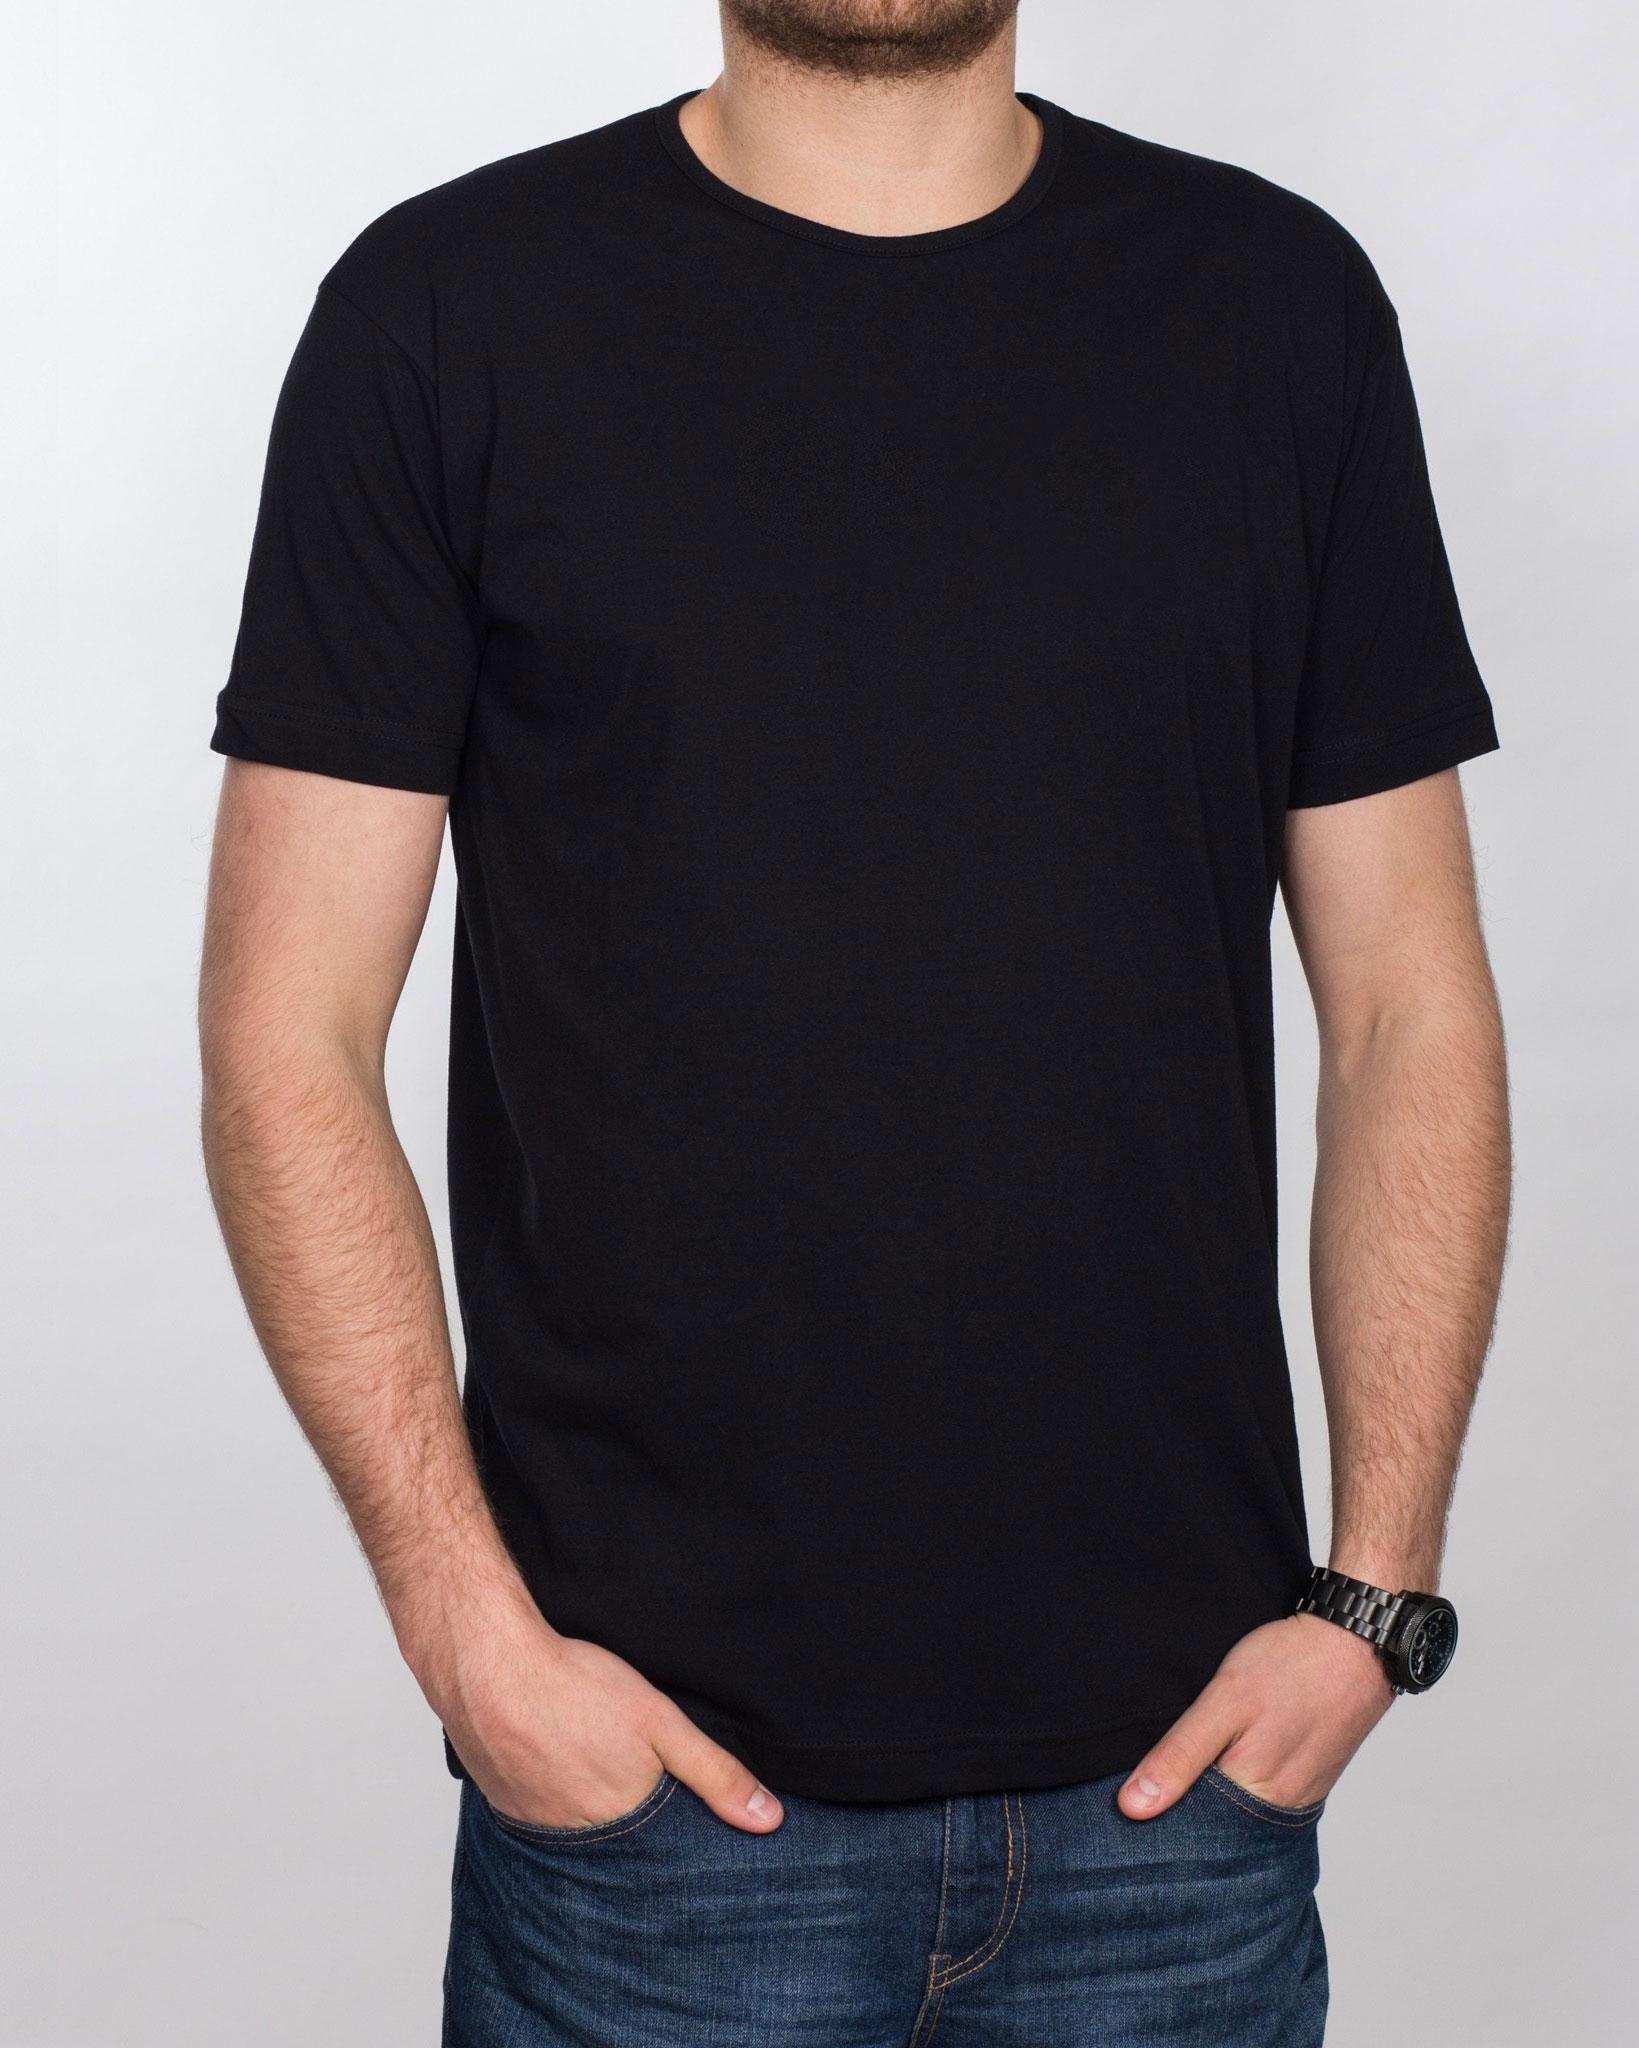 2t Tall T-Shirt (plain black)